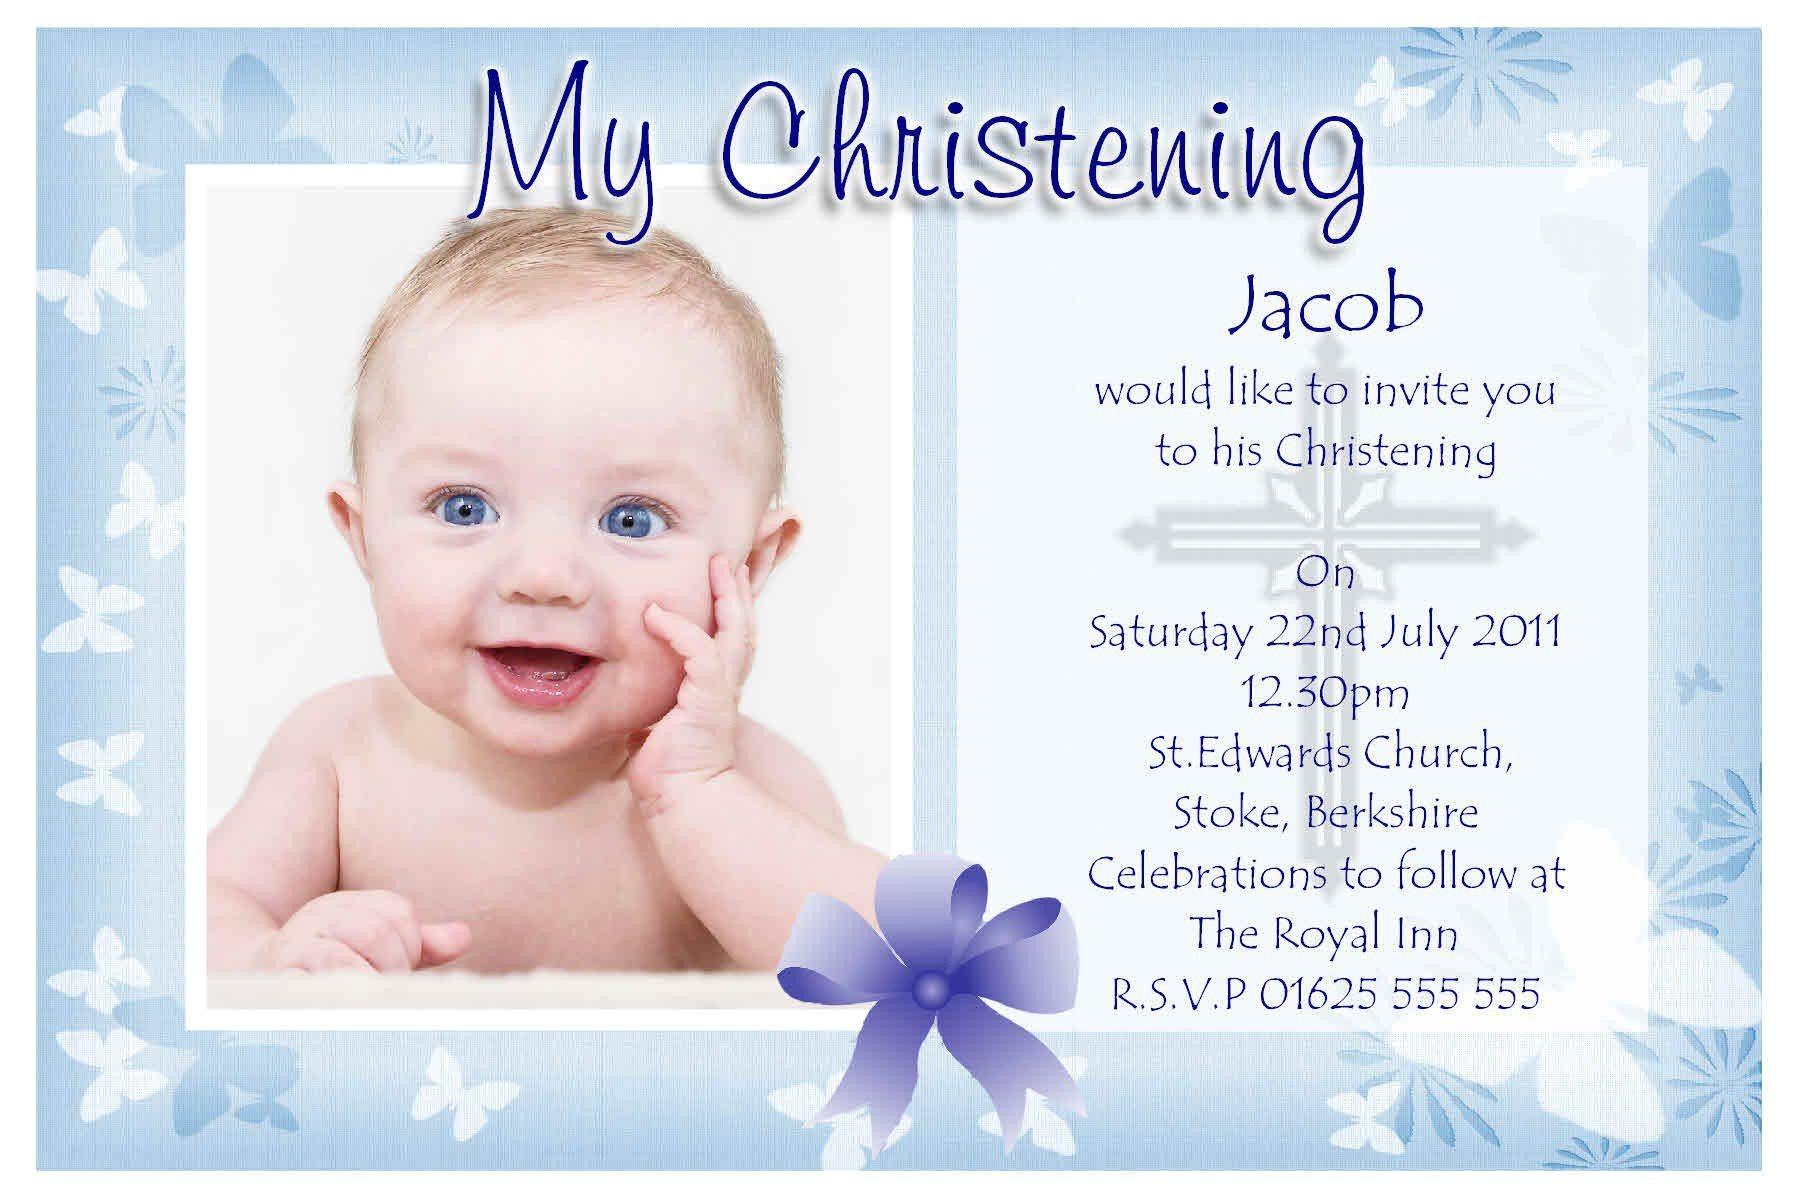 Sample Picture Of Baptismal Invitation Baptism Invitation Baptism Invitations for Boys New